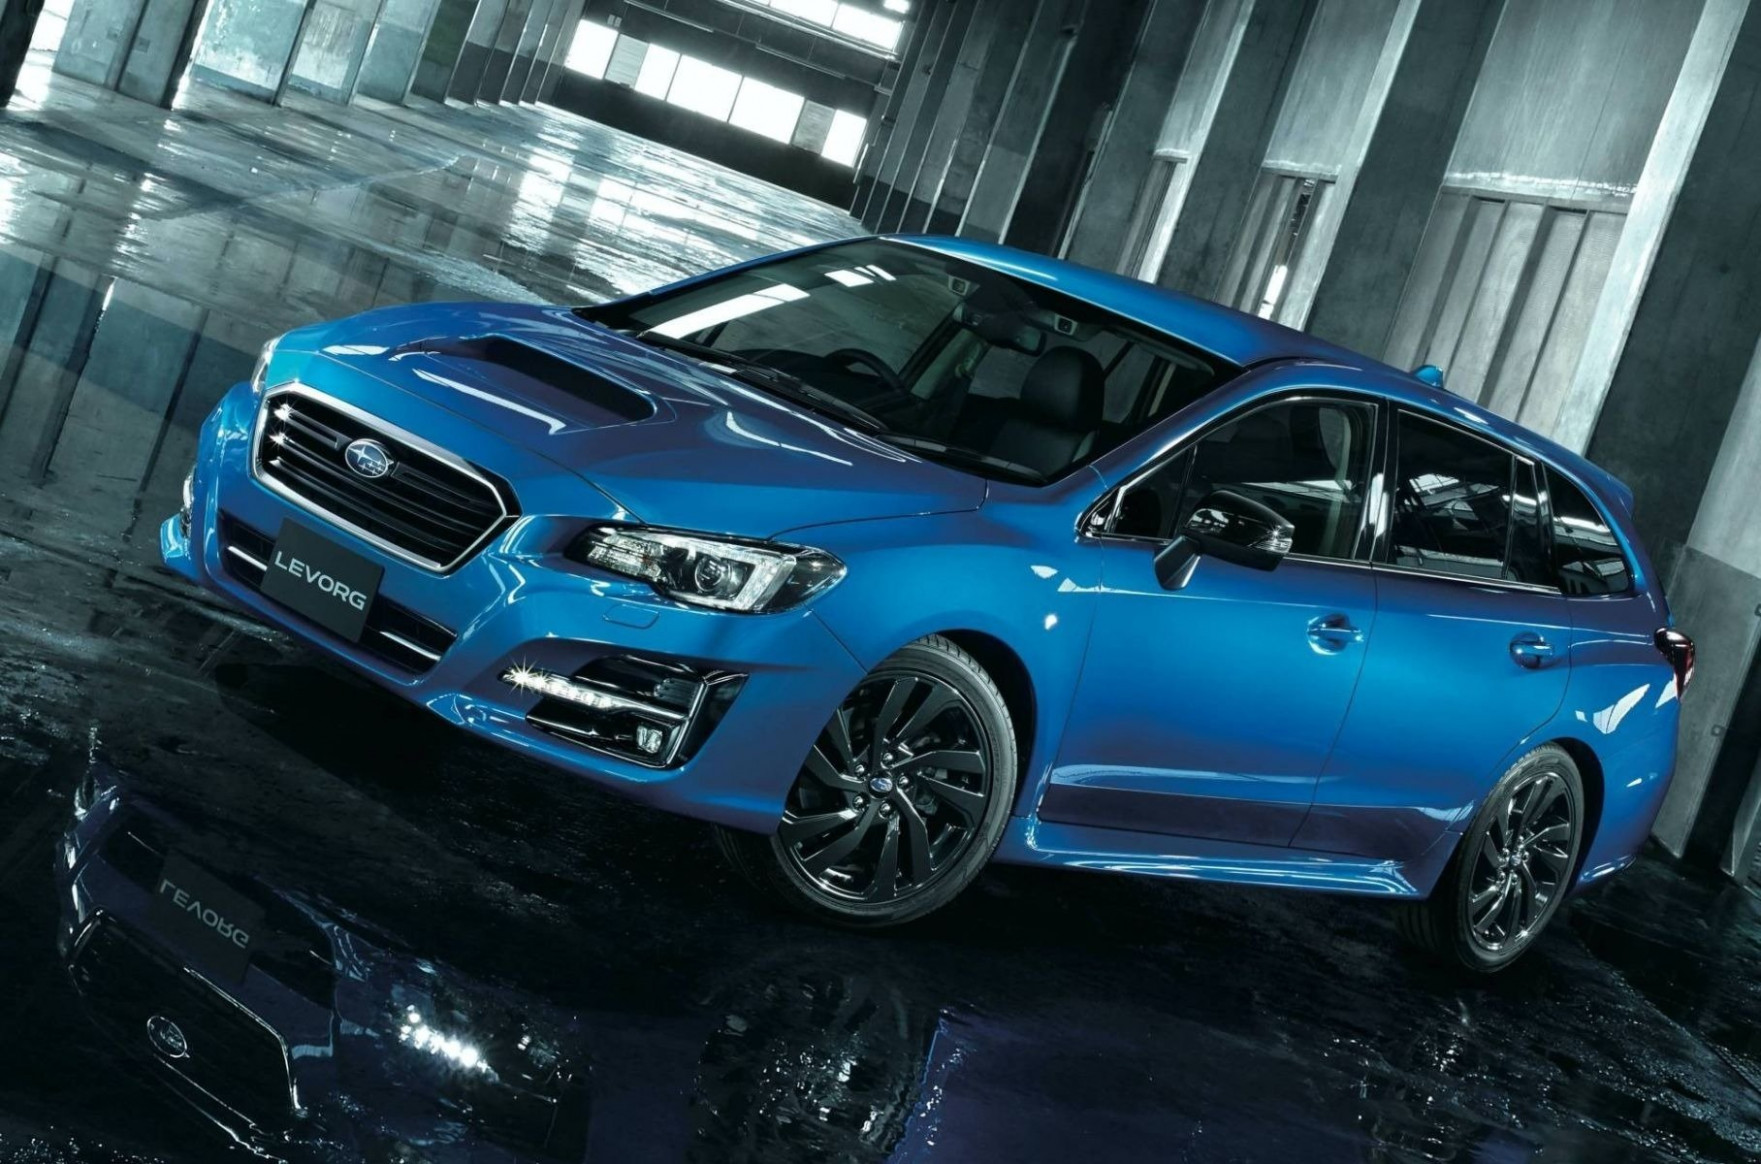 Exterior and Interior 2022 Subaru Legacy Turbo